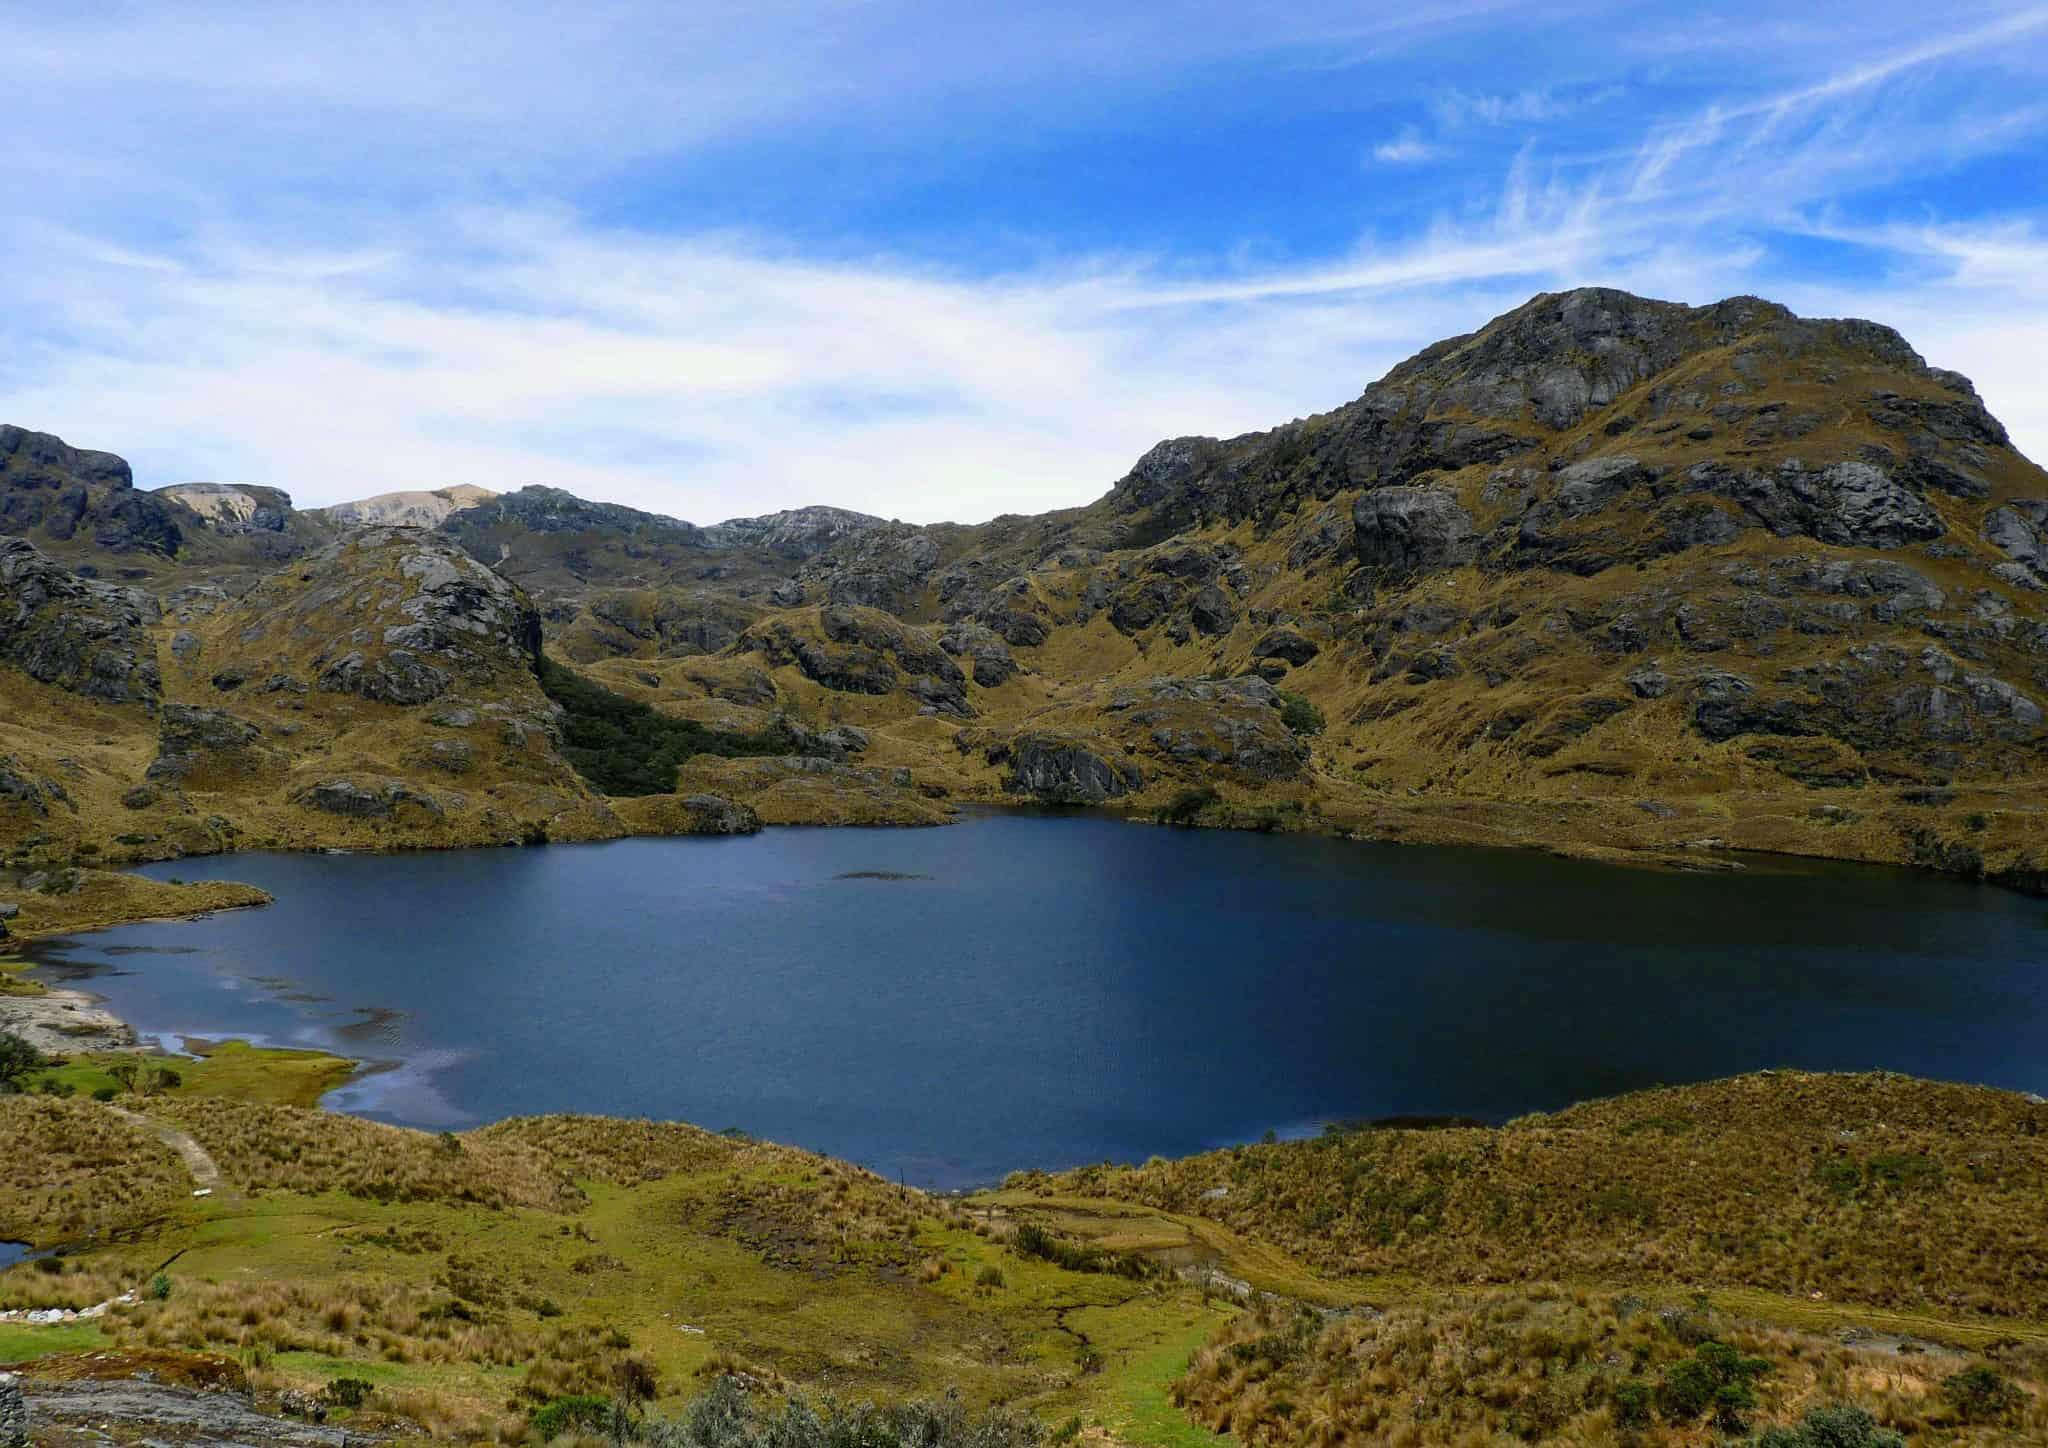 Lake Torreadora Cajas National Park